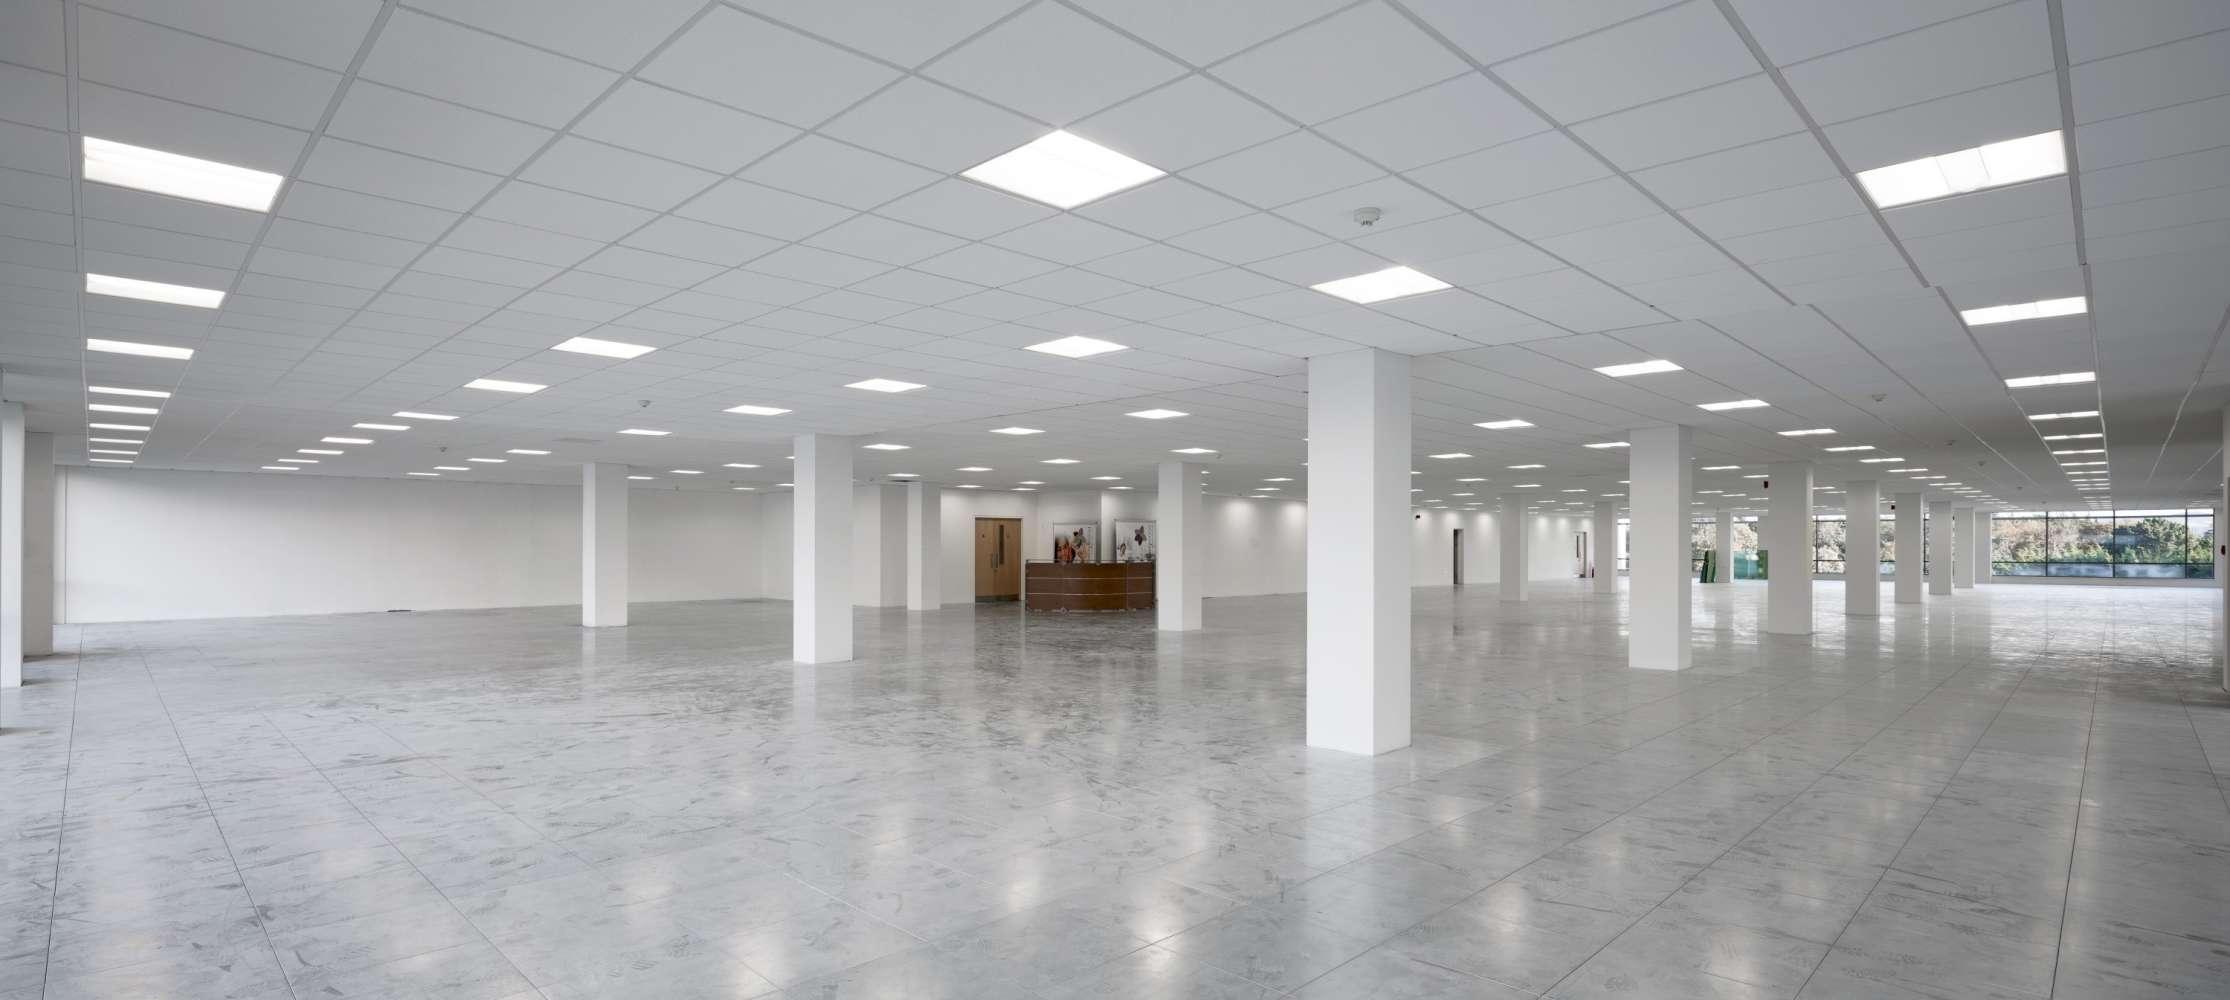 Office Co dublin, D18 K7W4 - Building 10, The Campus, Cherrywood